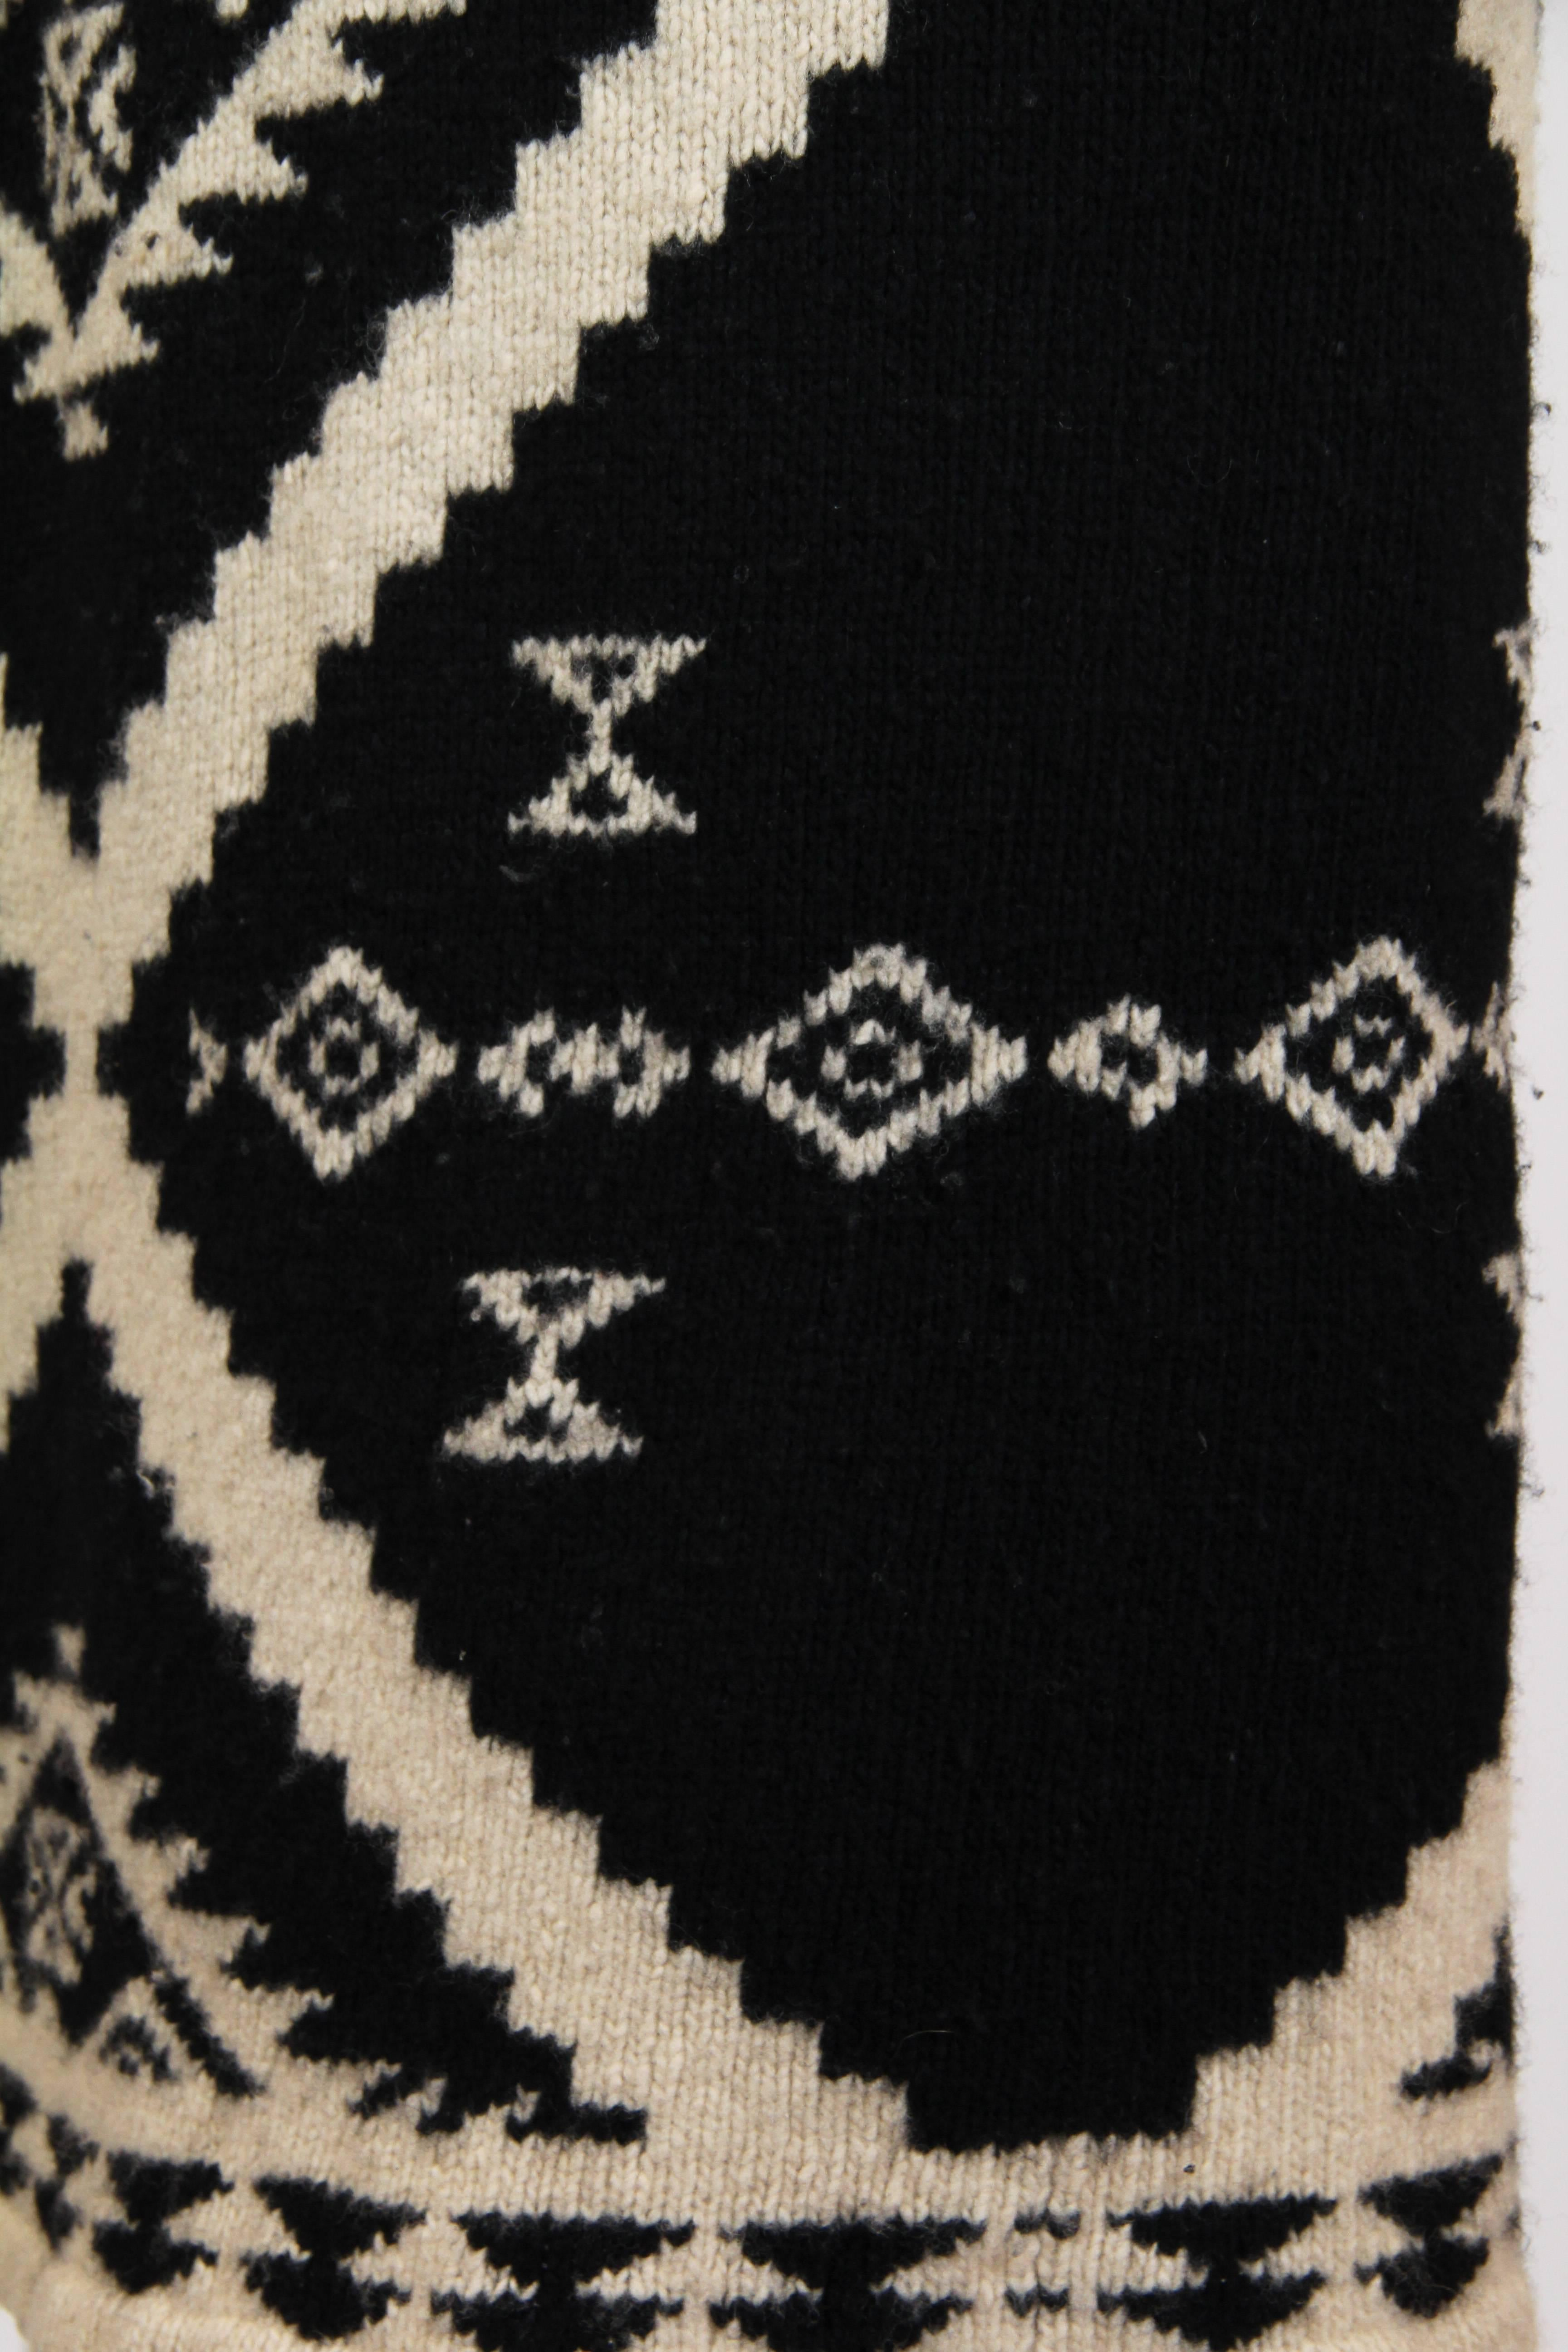 bcca0a14e Ralph Lauren Native American inspired Sweater at 1stdibs